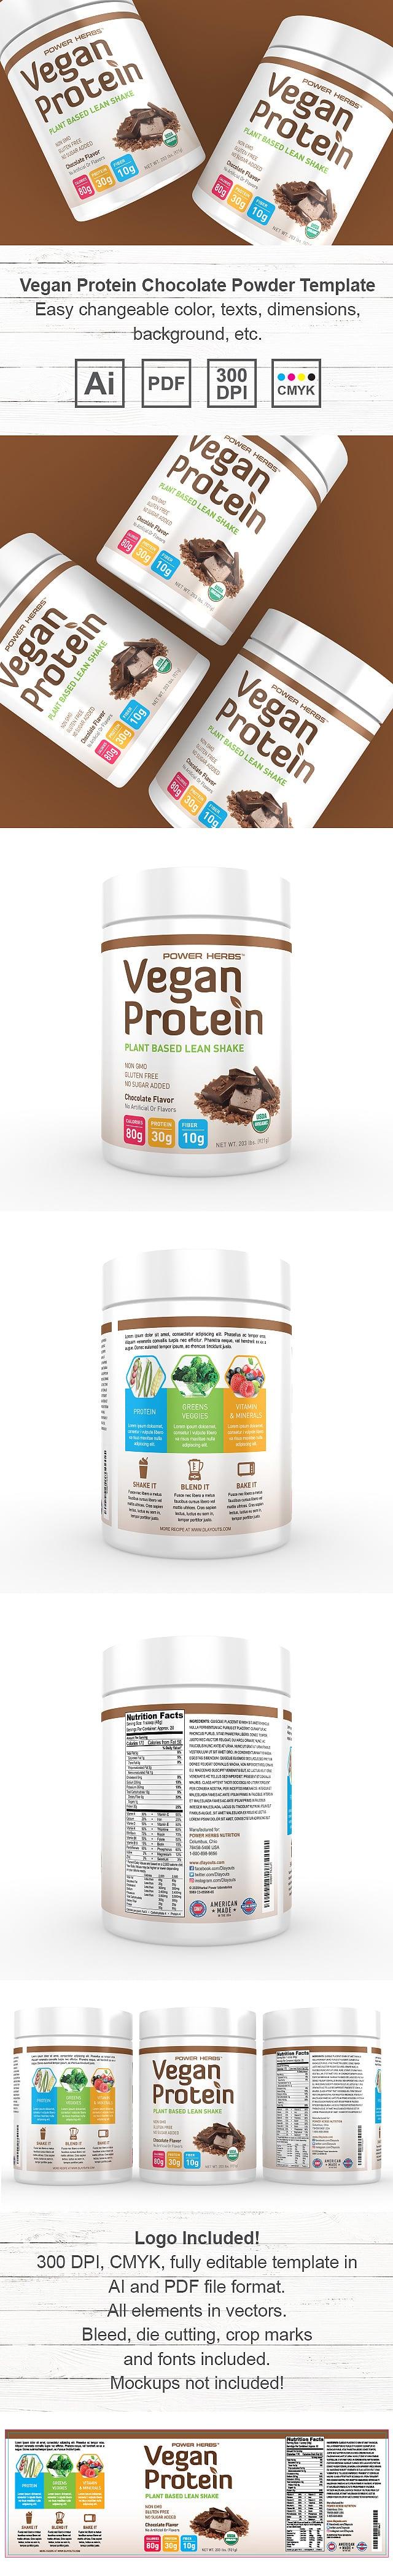 Vegan Protein Chocolate Powder Supplement Label Template